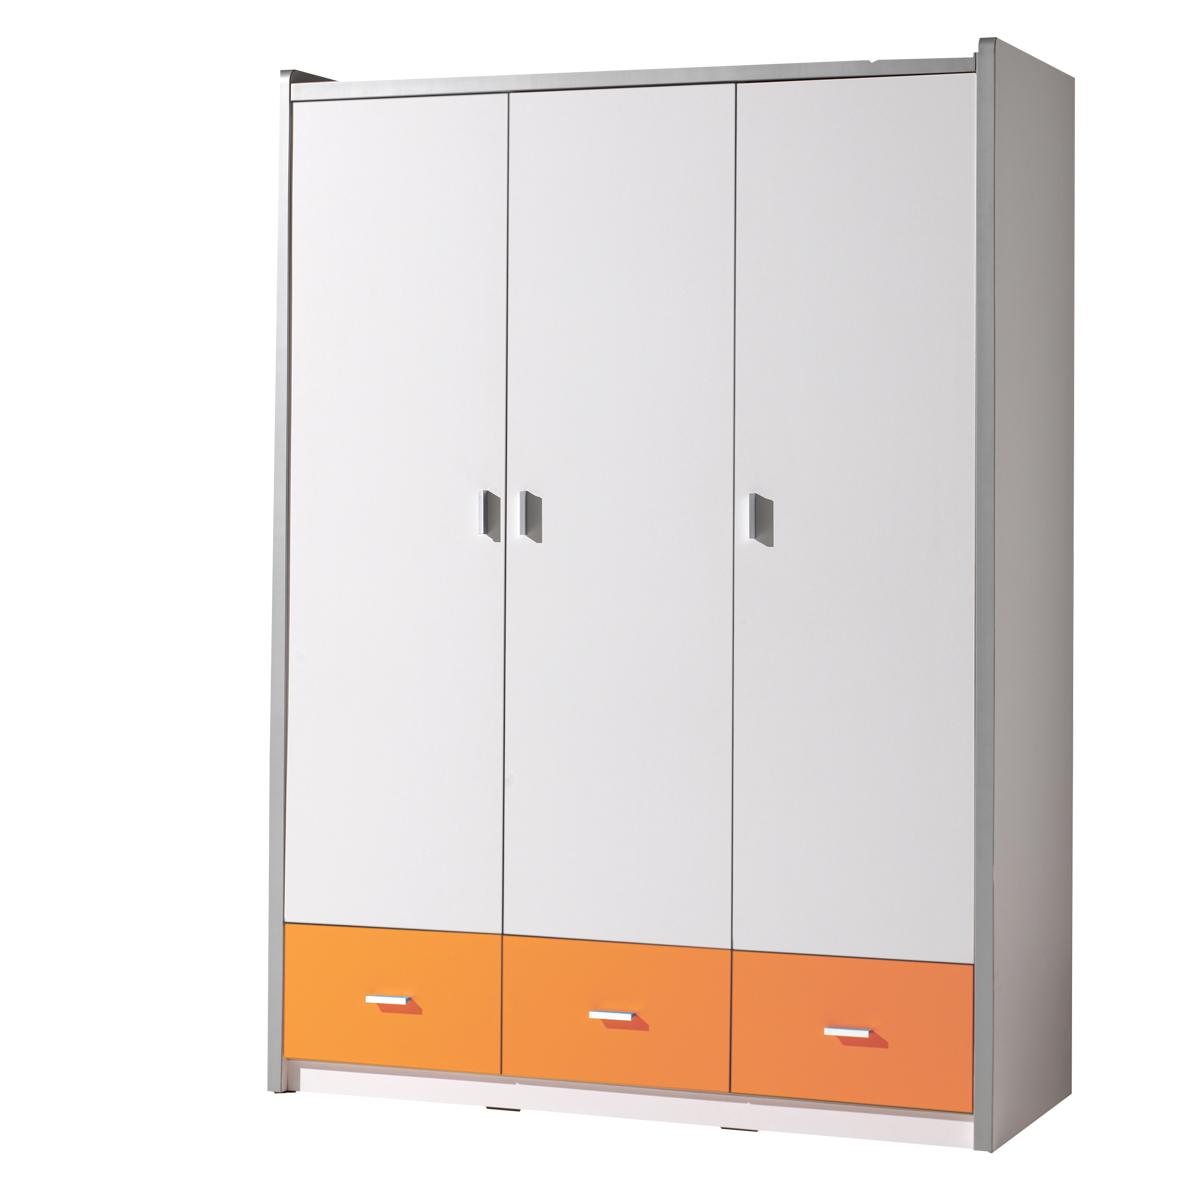 Vipack - Armoire 3 portes Bonny - Orange